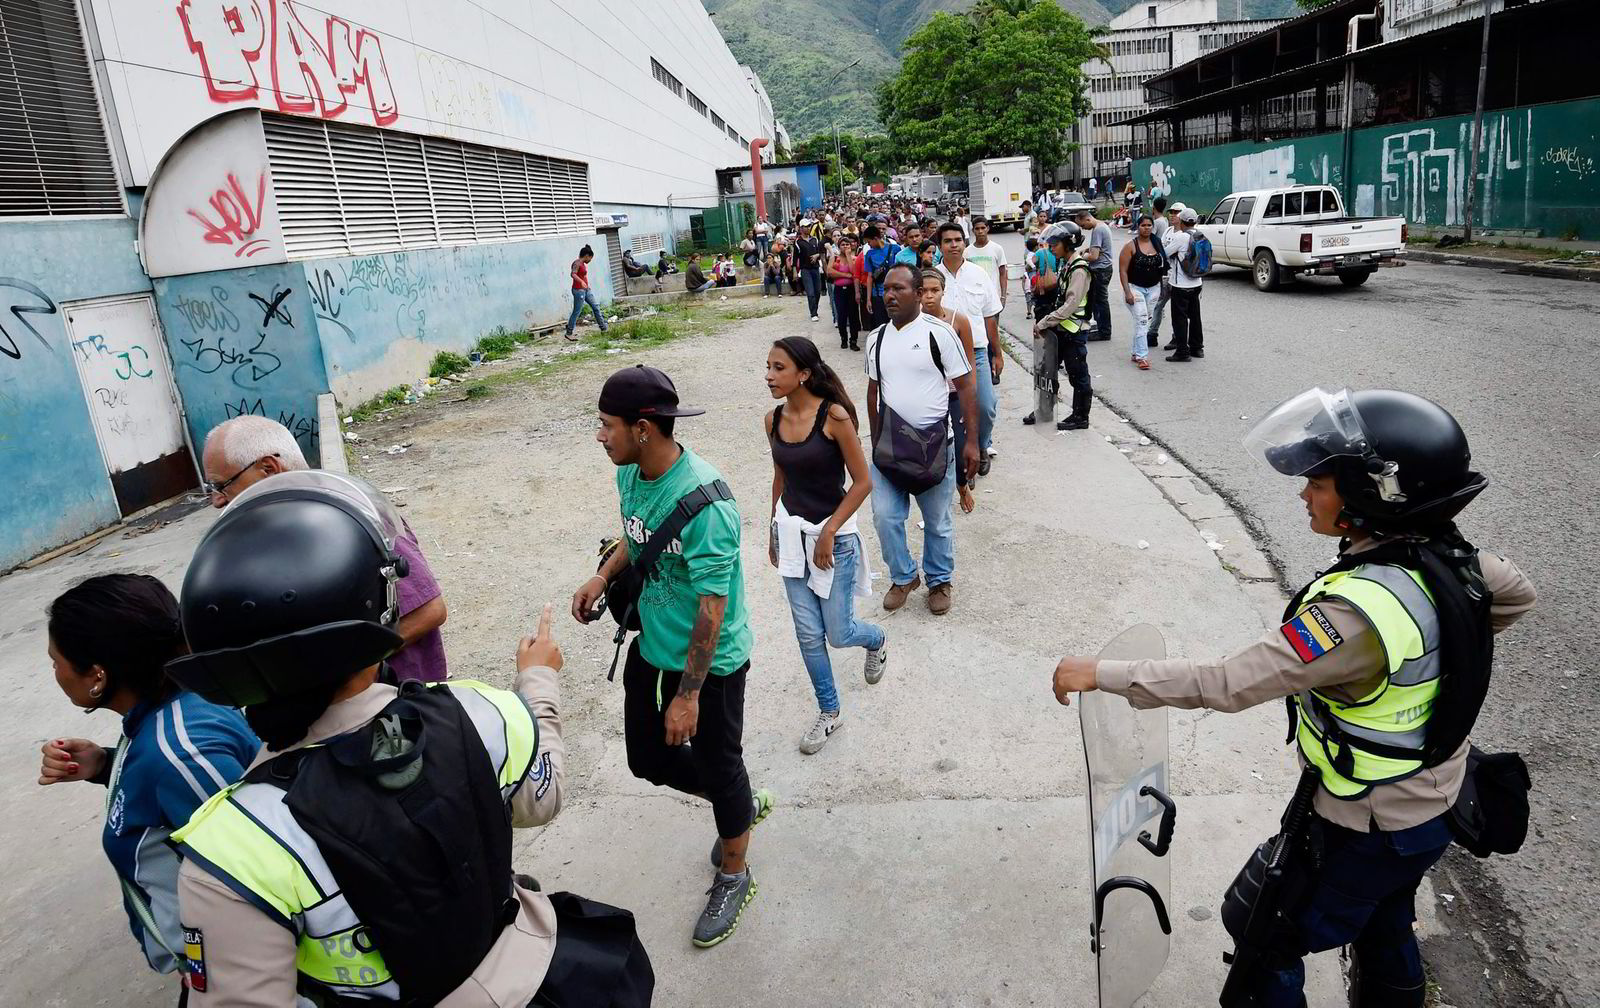 Over 70 prosent av Venezuelas befolkning lever i dag under fattigdomsgrensen. Bildet er fra en matkø i Caracas. FOTO: Juan Barreto/AFP/NTB Scanpix